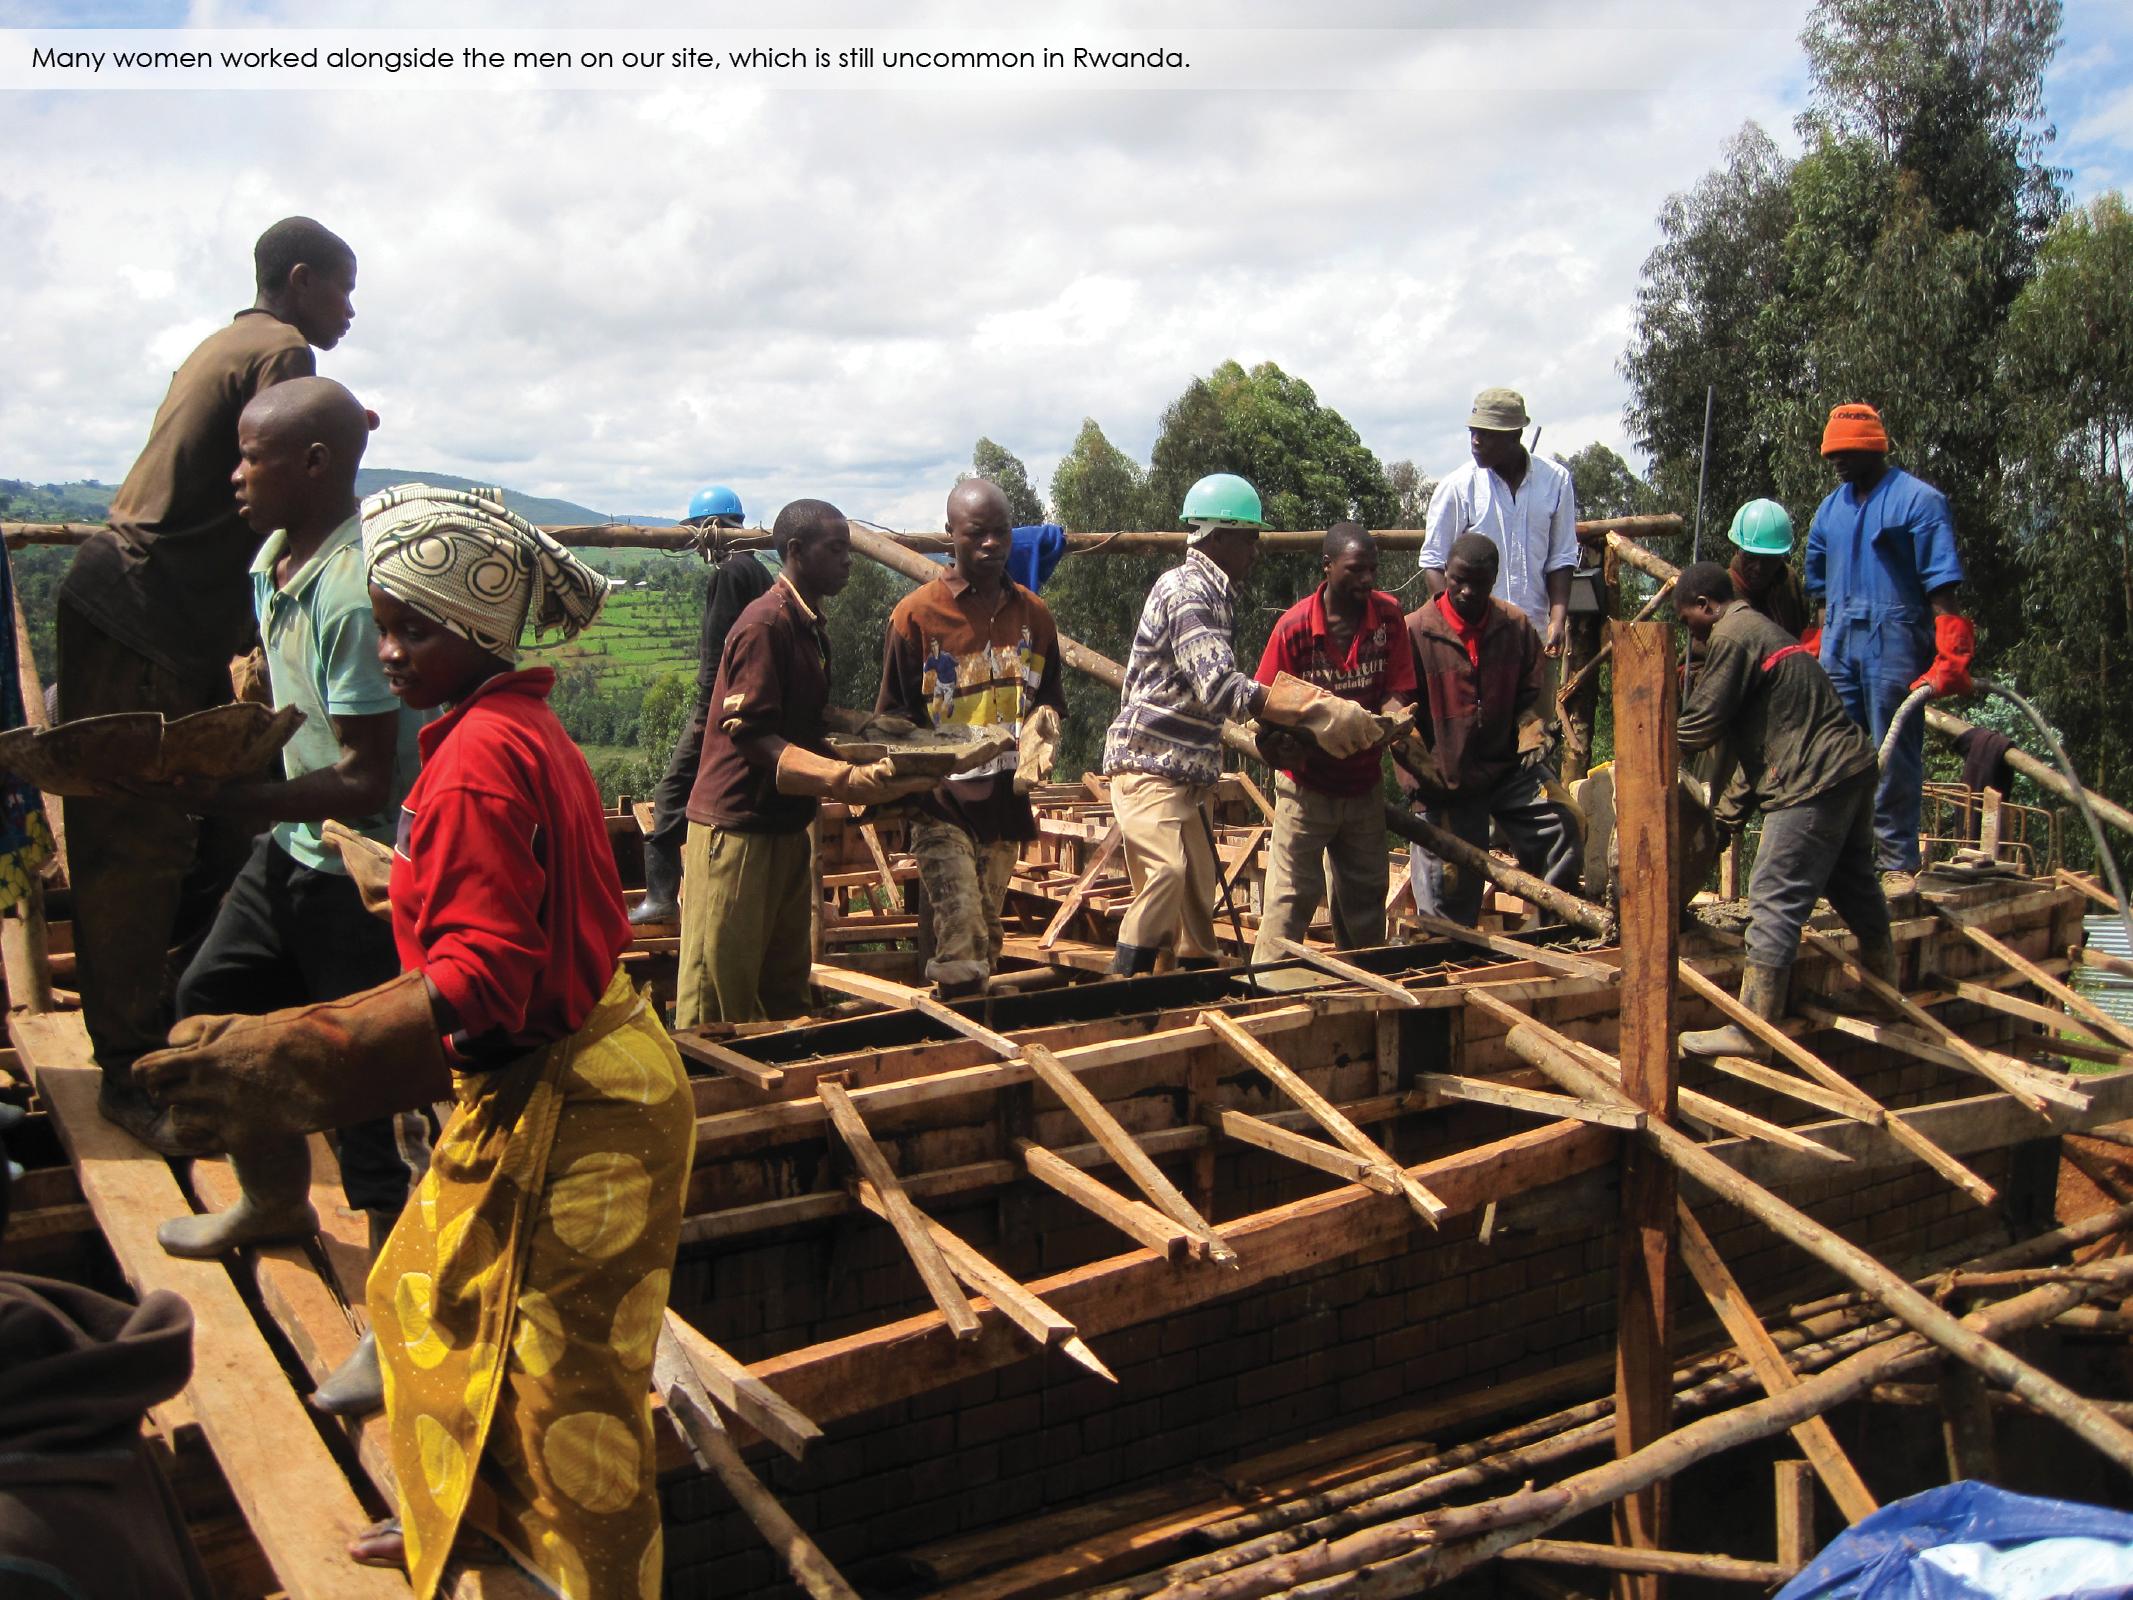 Gaugler_RwandaExperience_p27.jpg